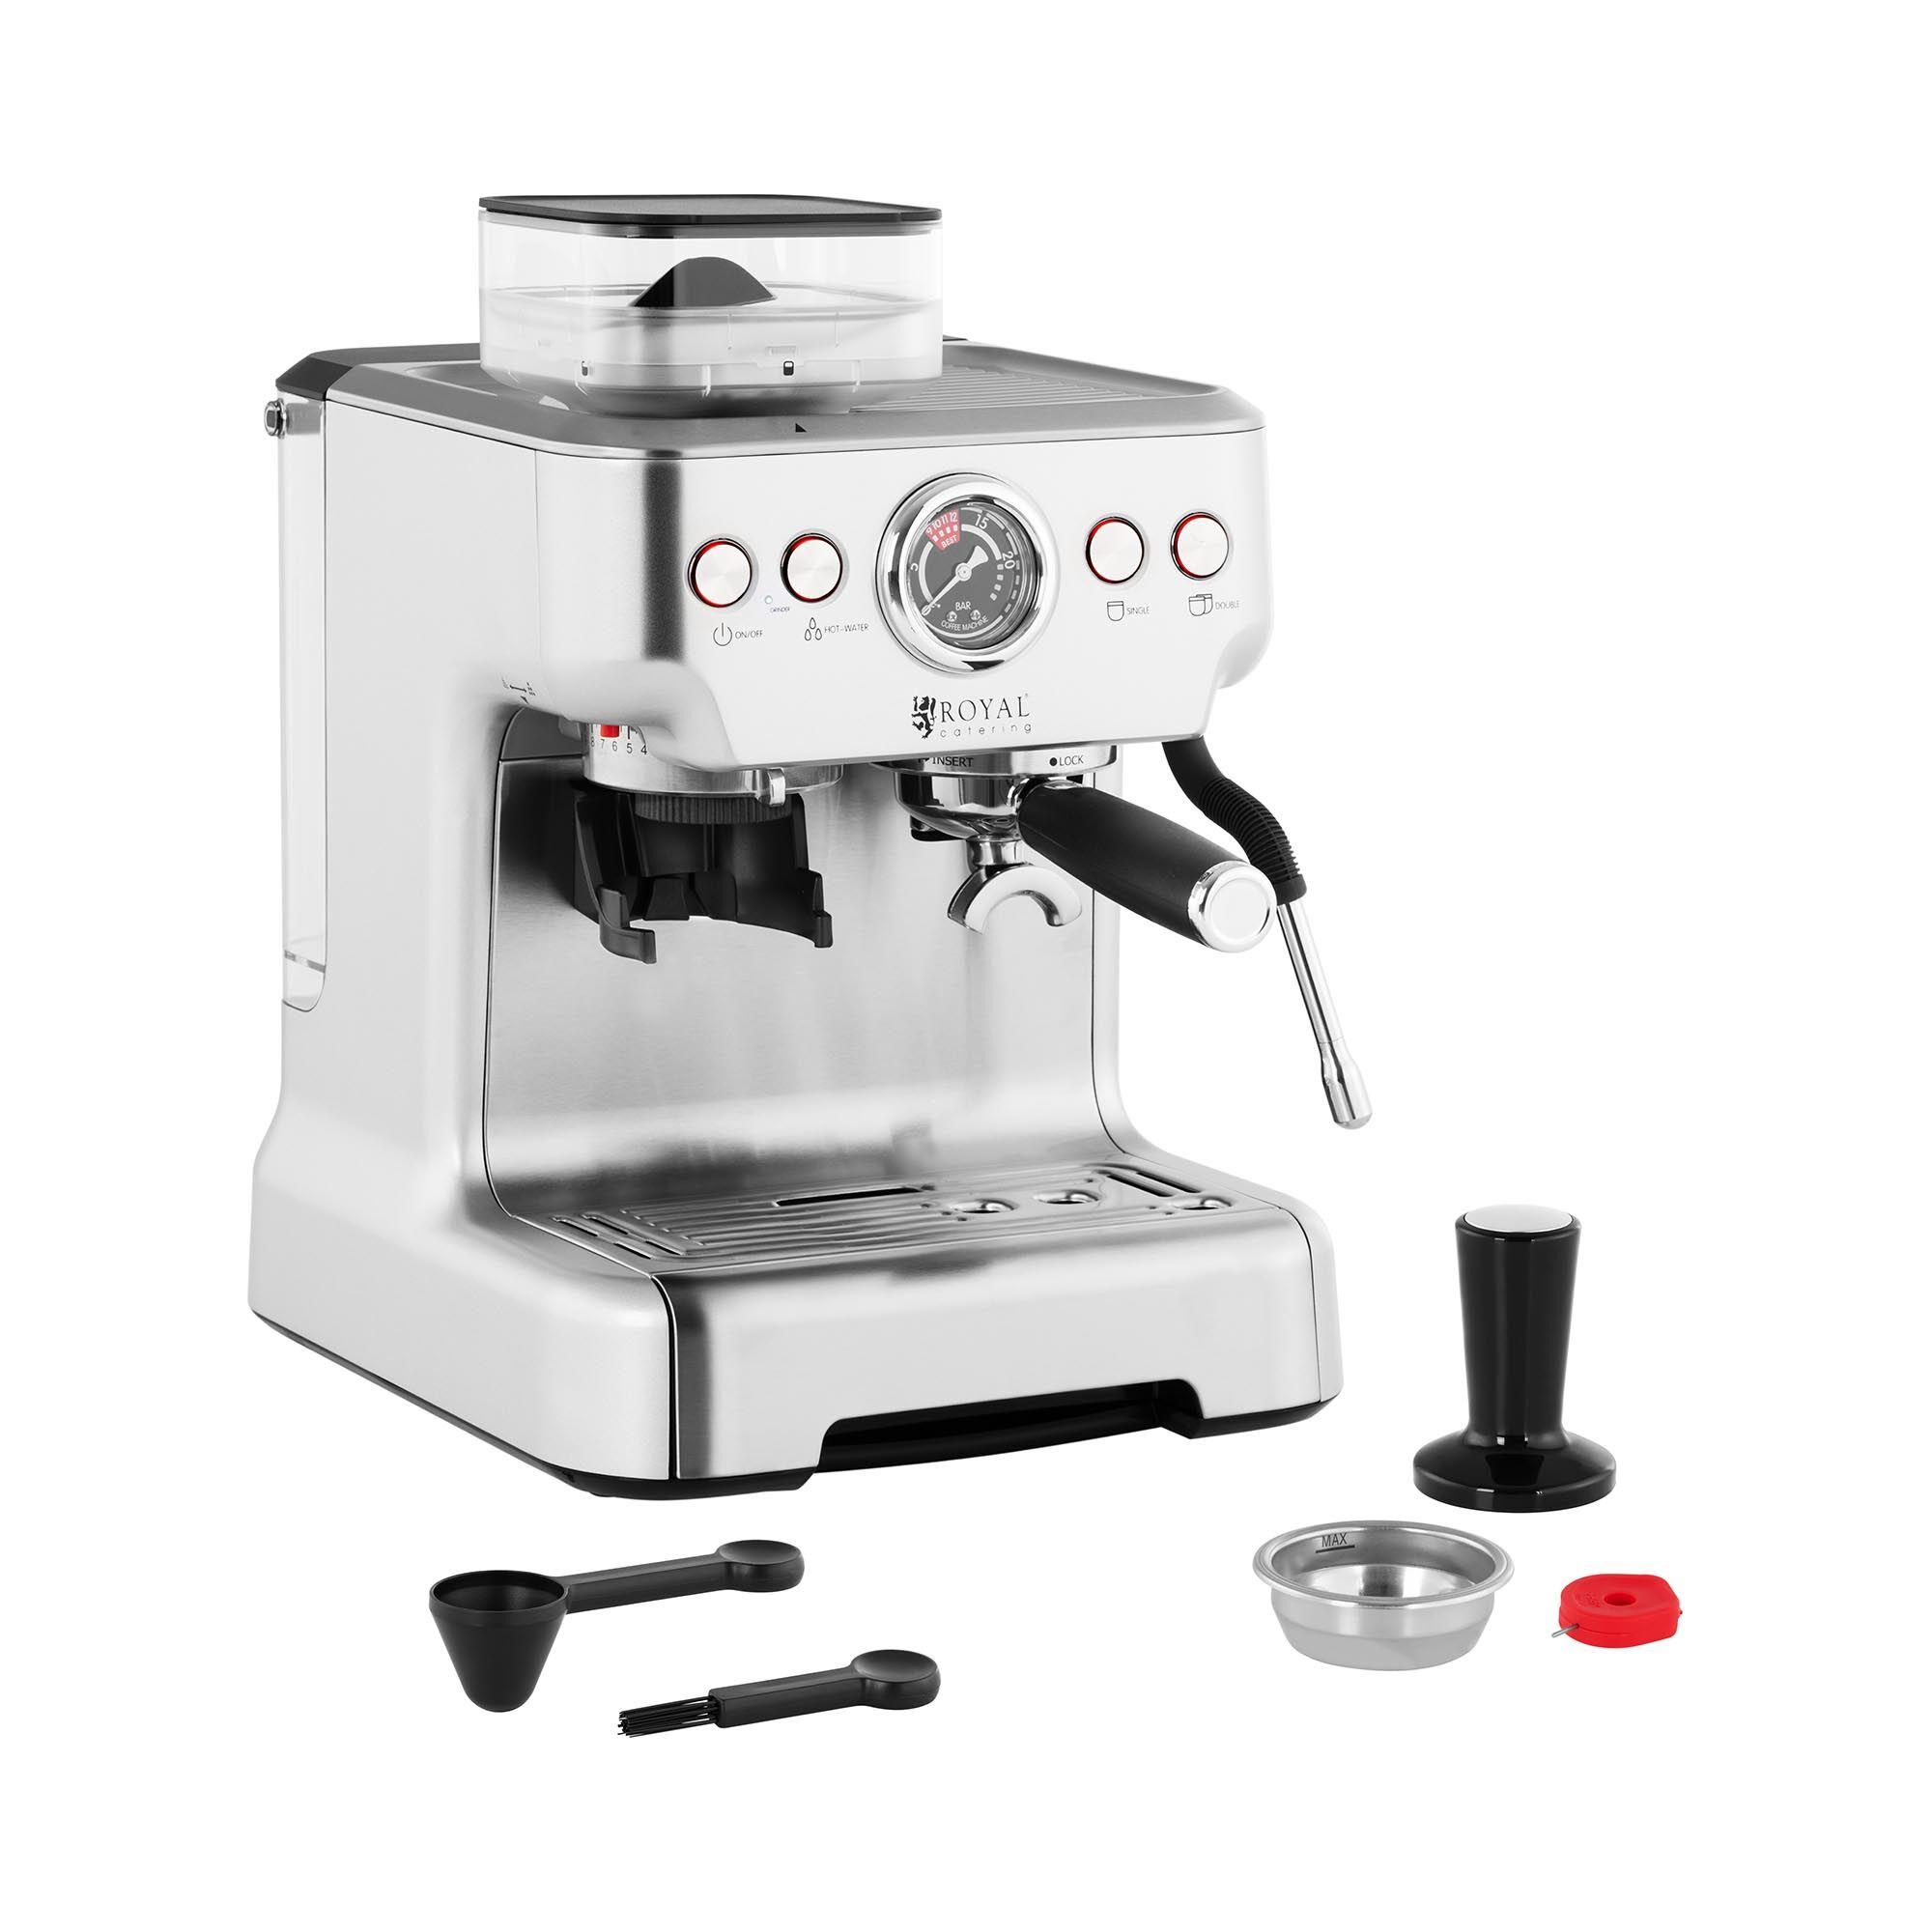 Royal Catering Macchina caffè espresso - 20 bar - Serbatoio acqua di 2,5 L RC-BCPM01